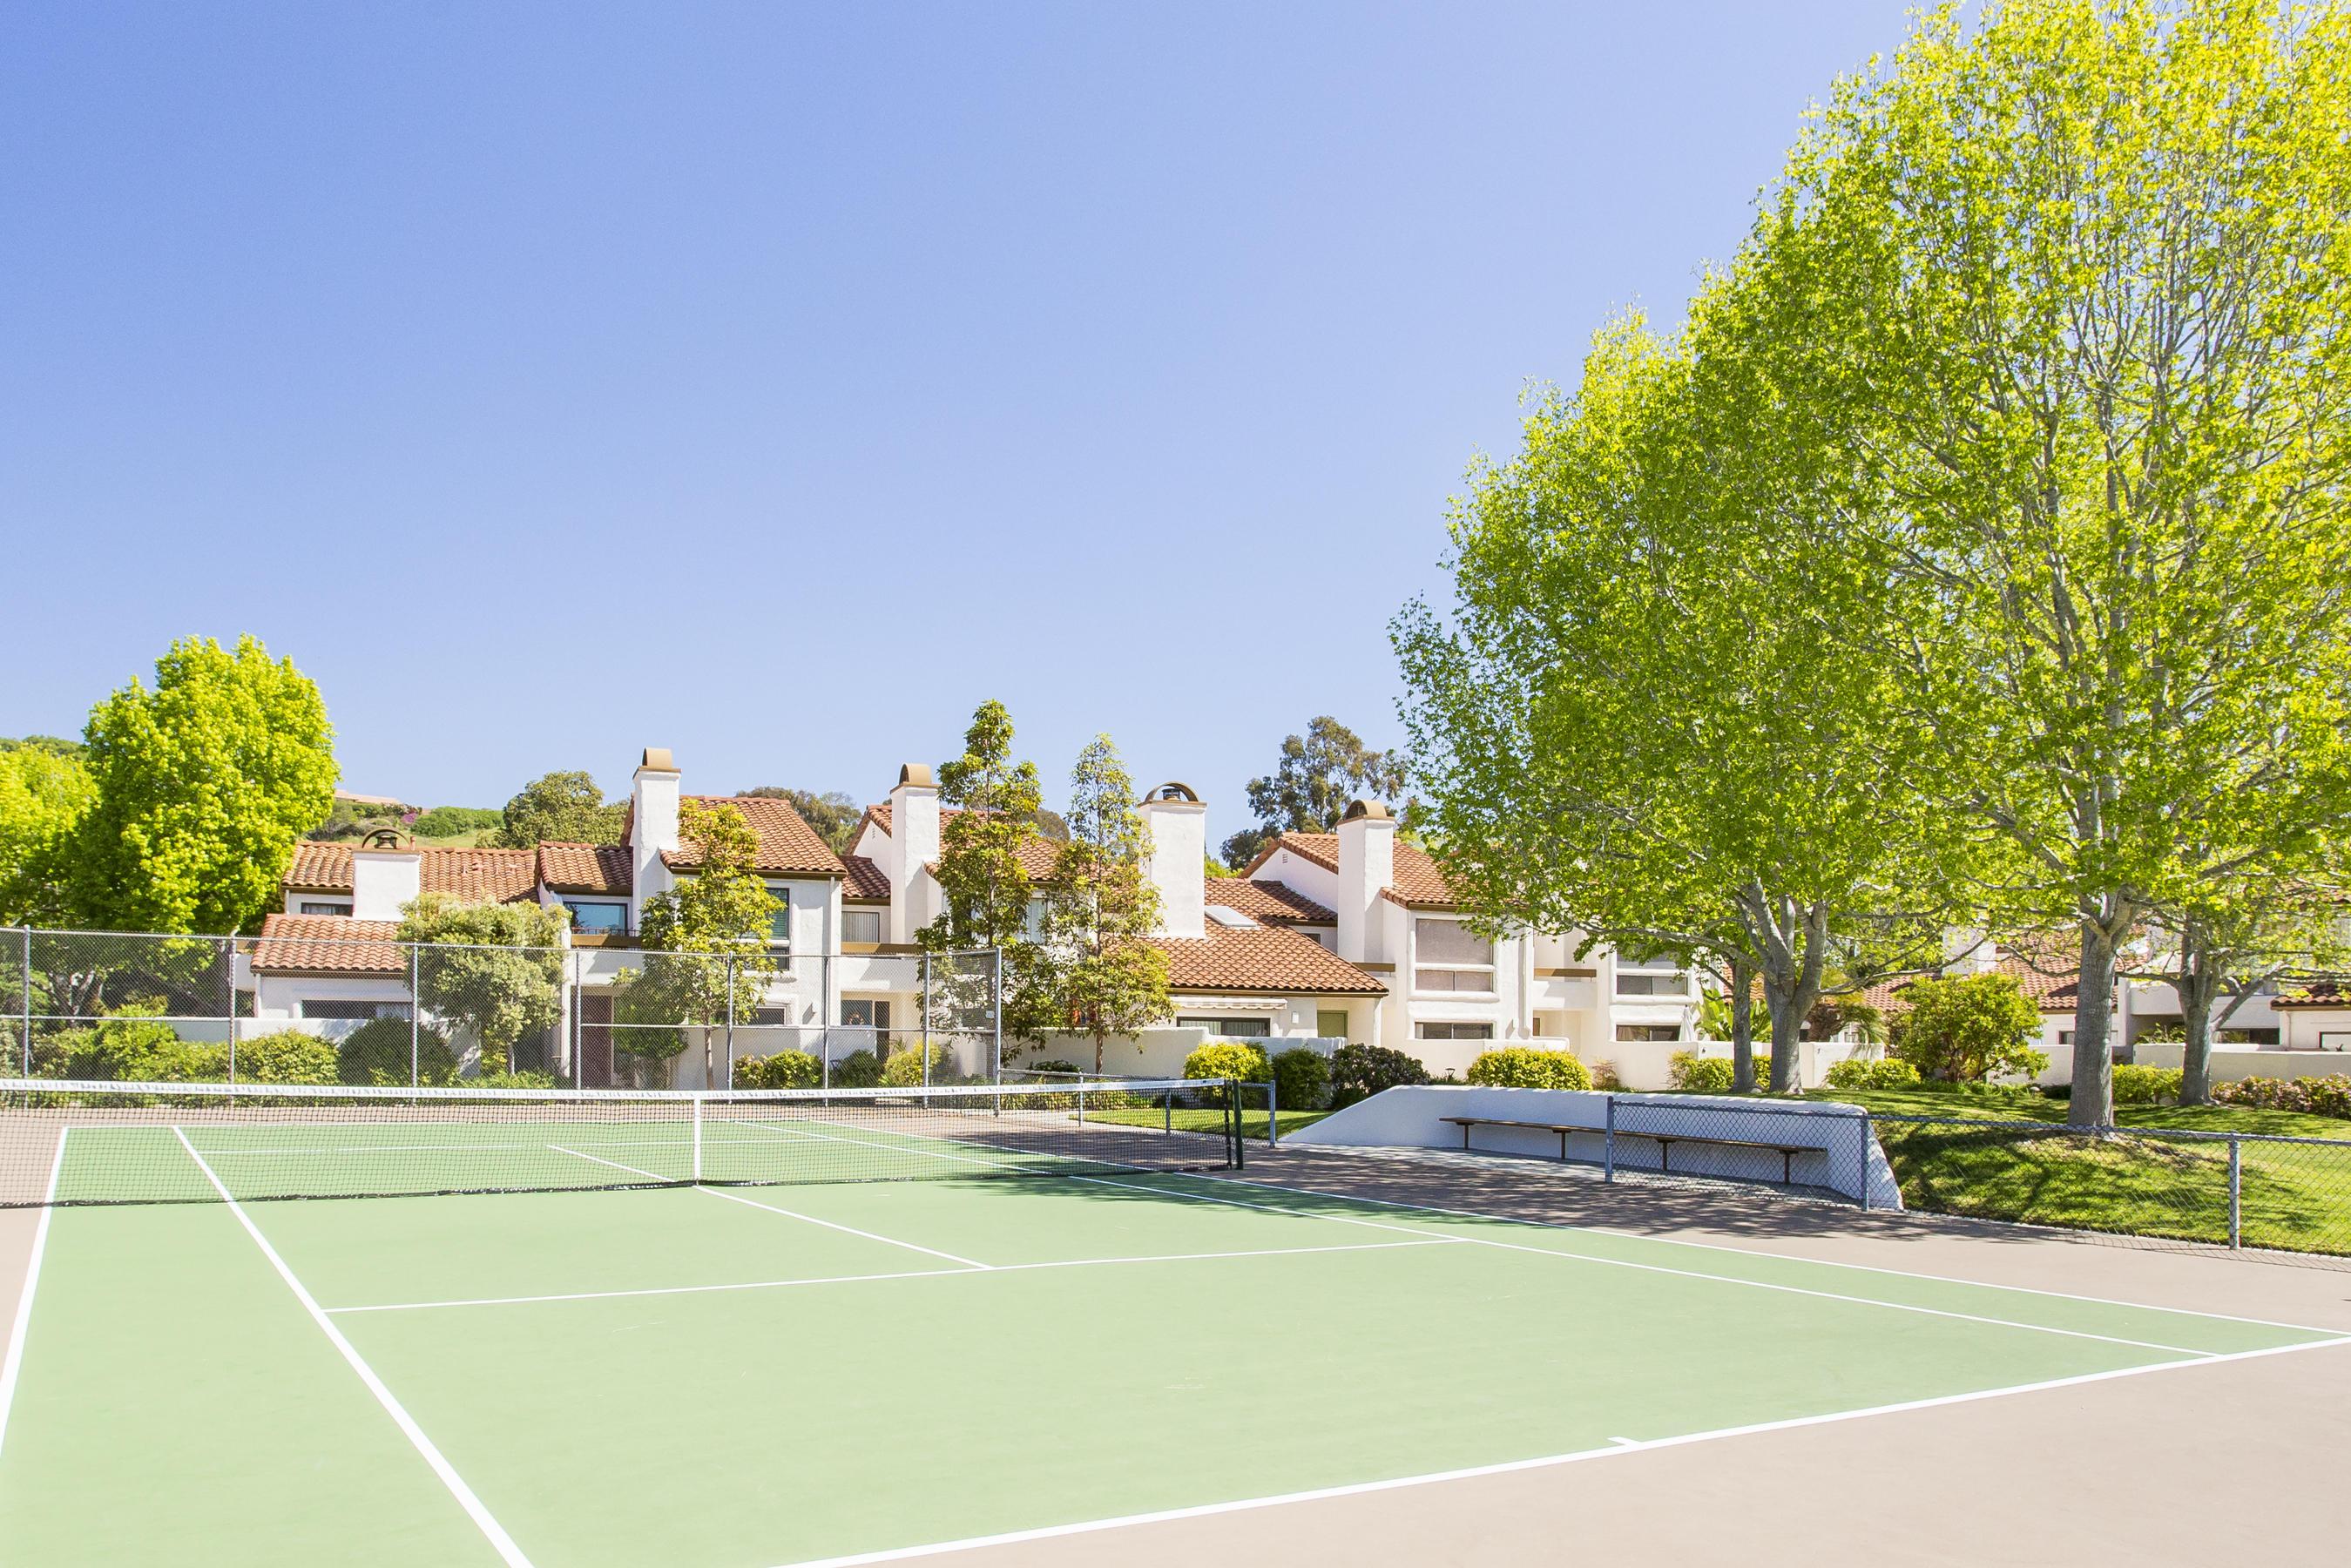 Property photo for 2051 Cliff Dr #1 Santa Barbara, California 93109 - 16-1114